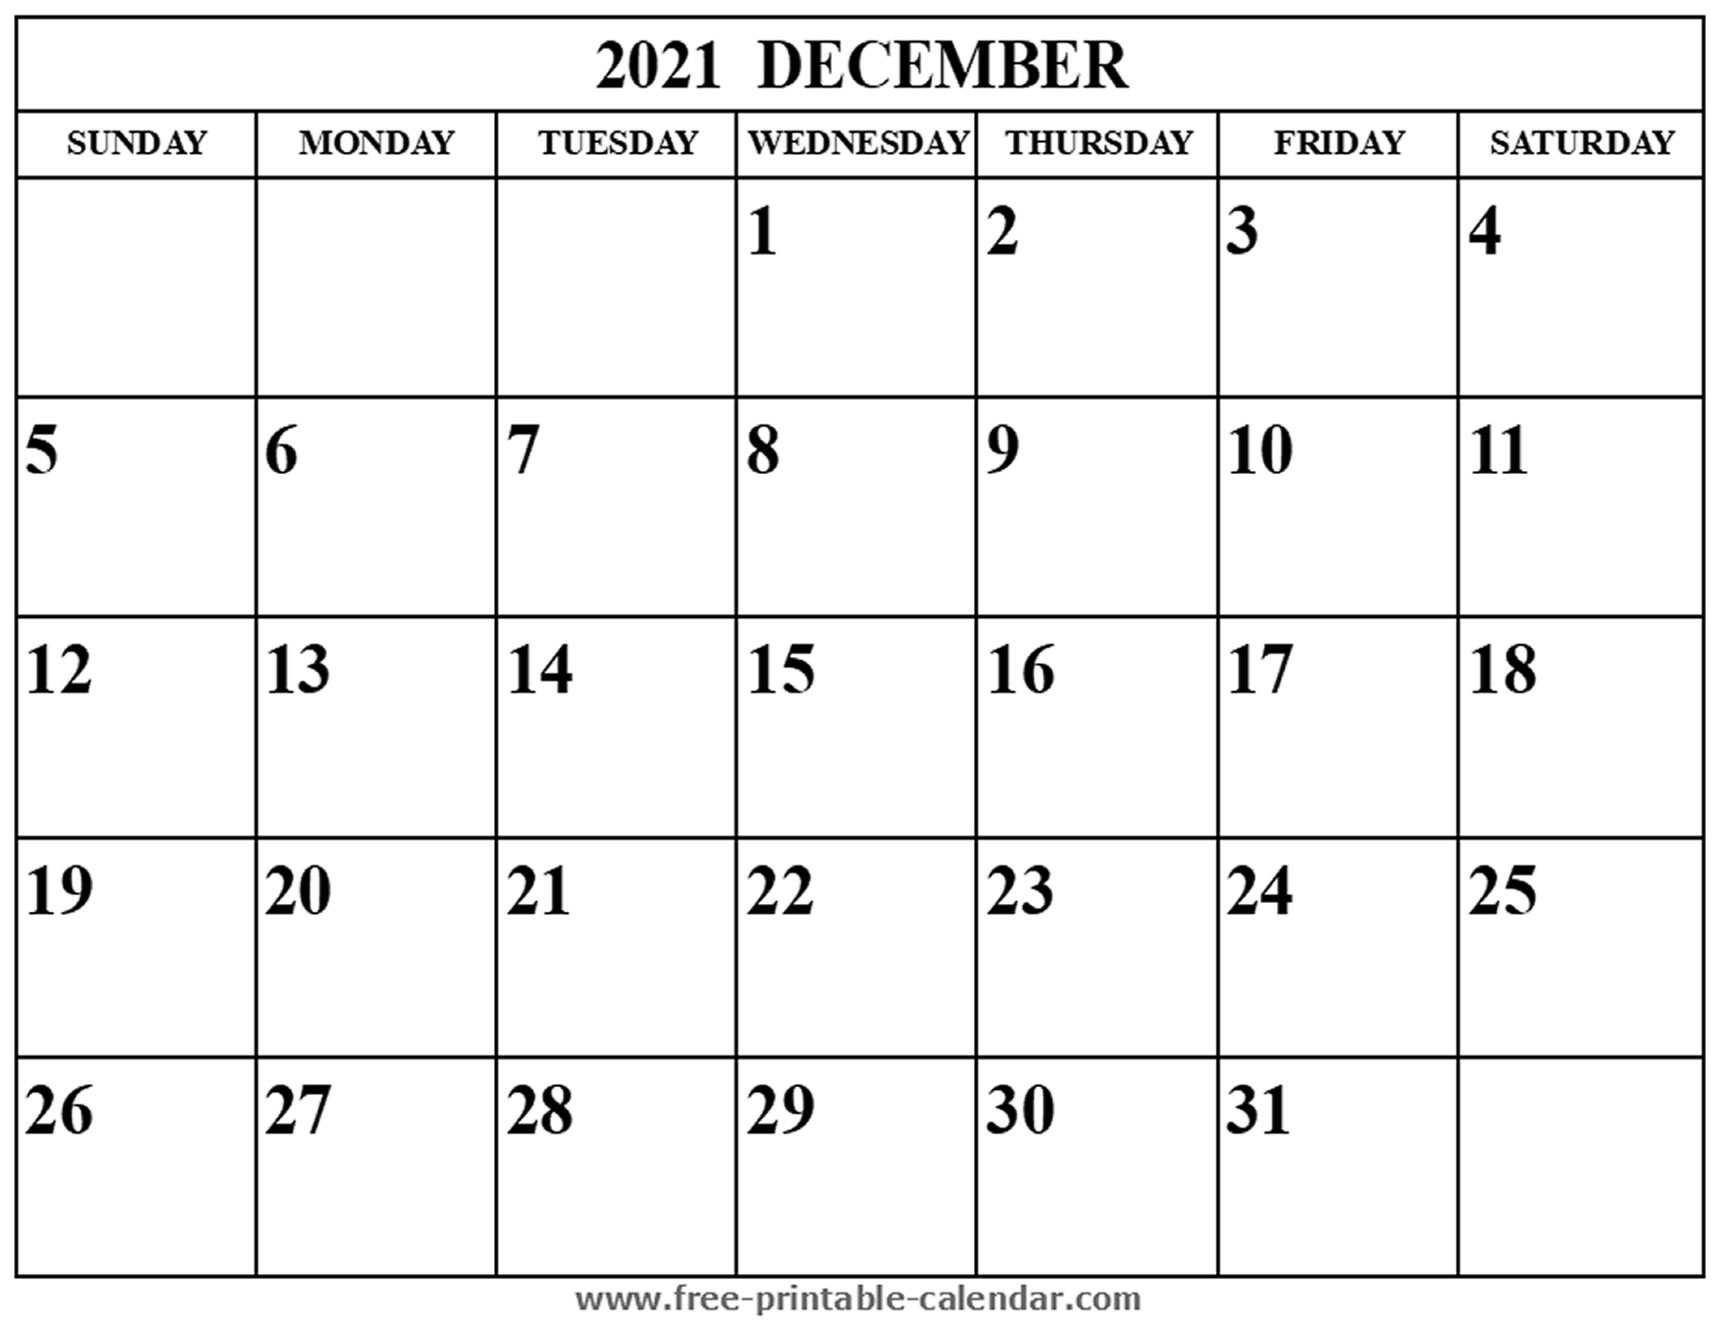 Blank December 2021 Calendar - Free-Printable-Calendar